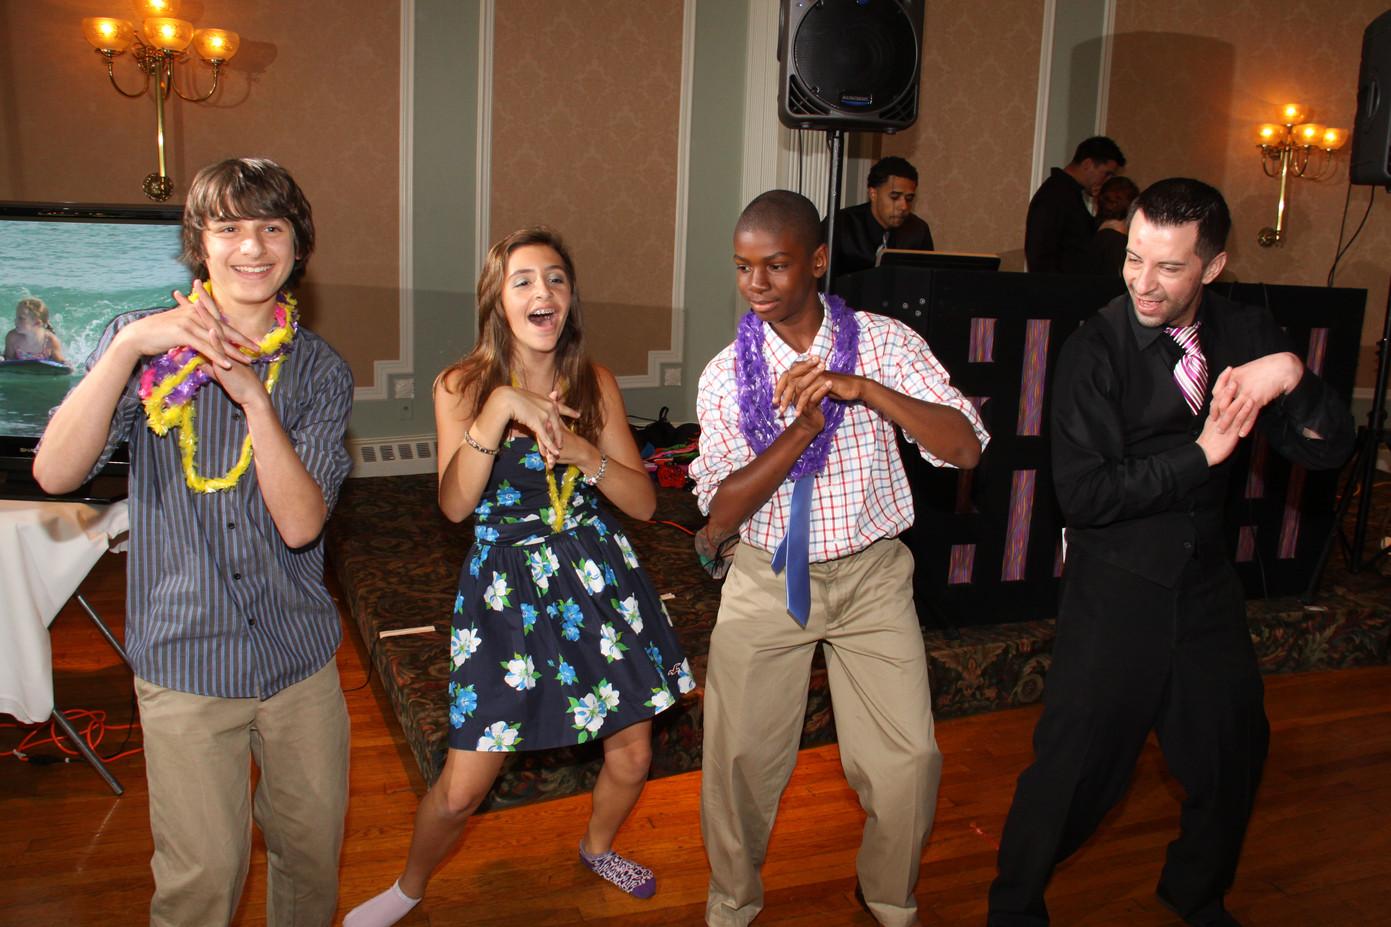 Dancing-Guest-With-Mc.JPG